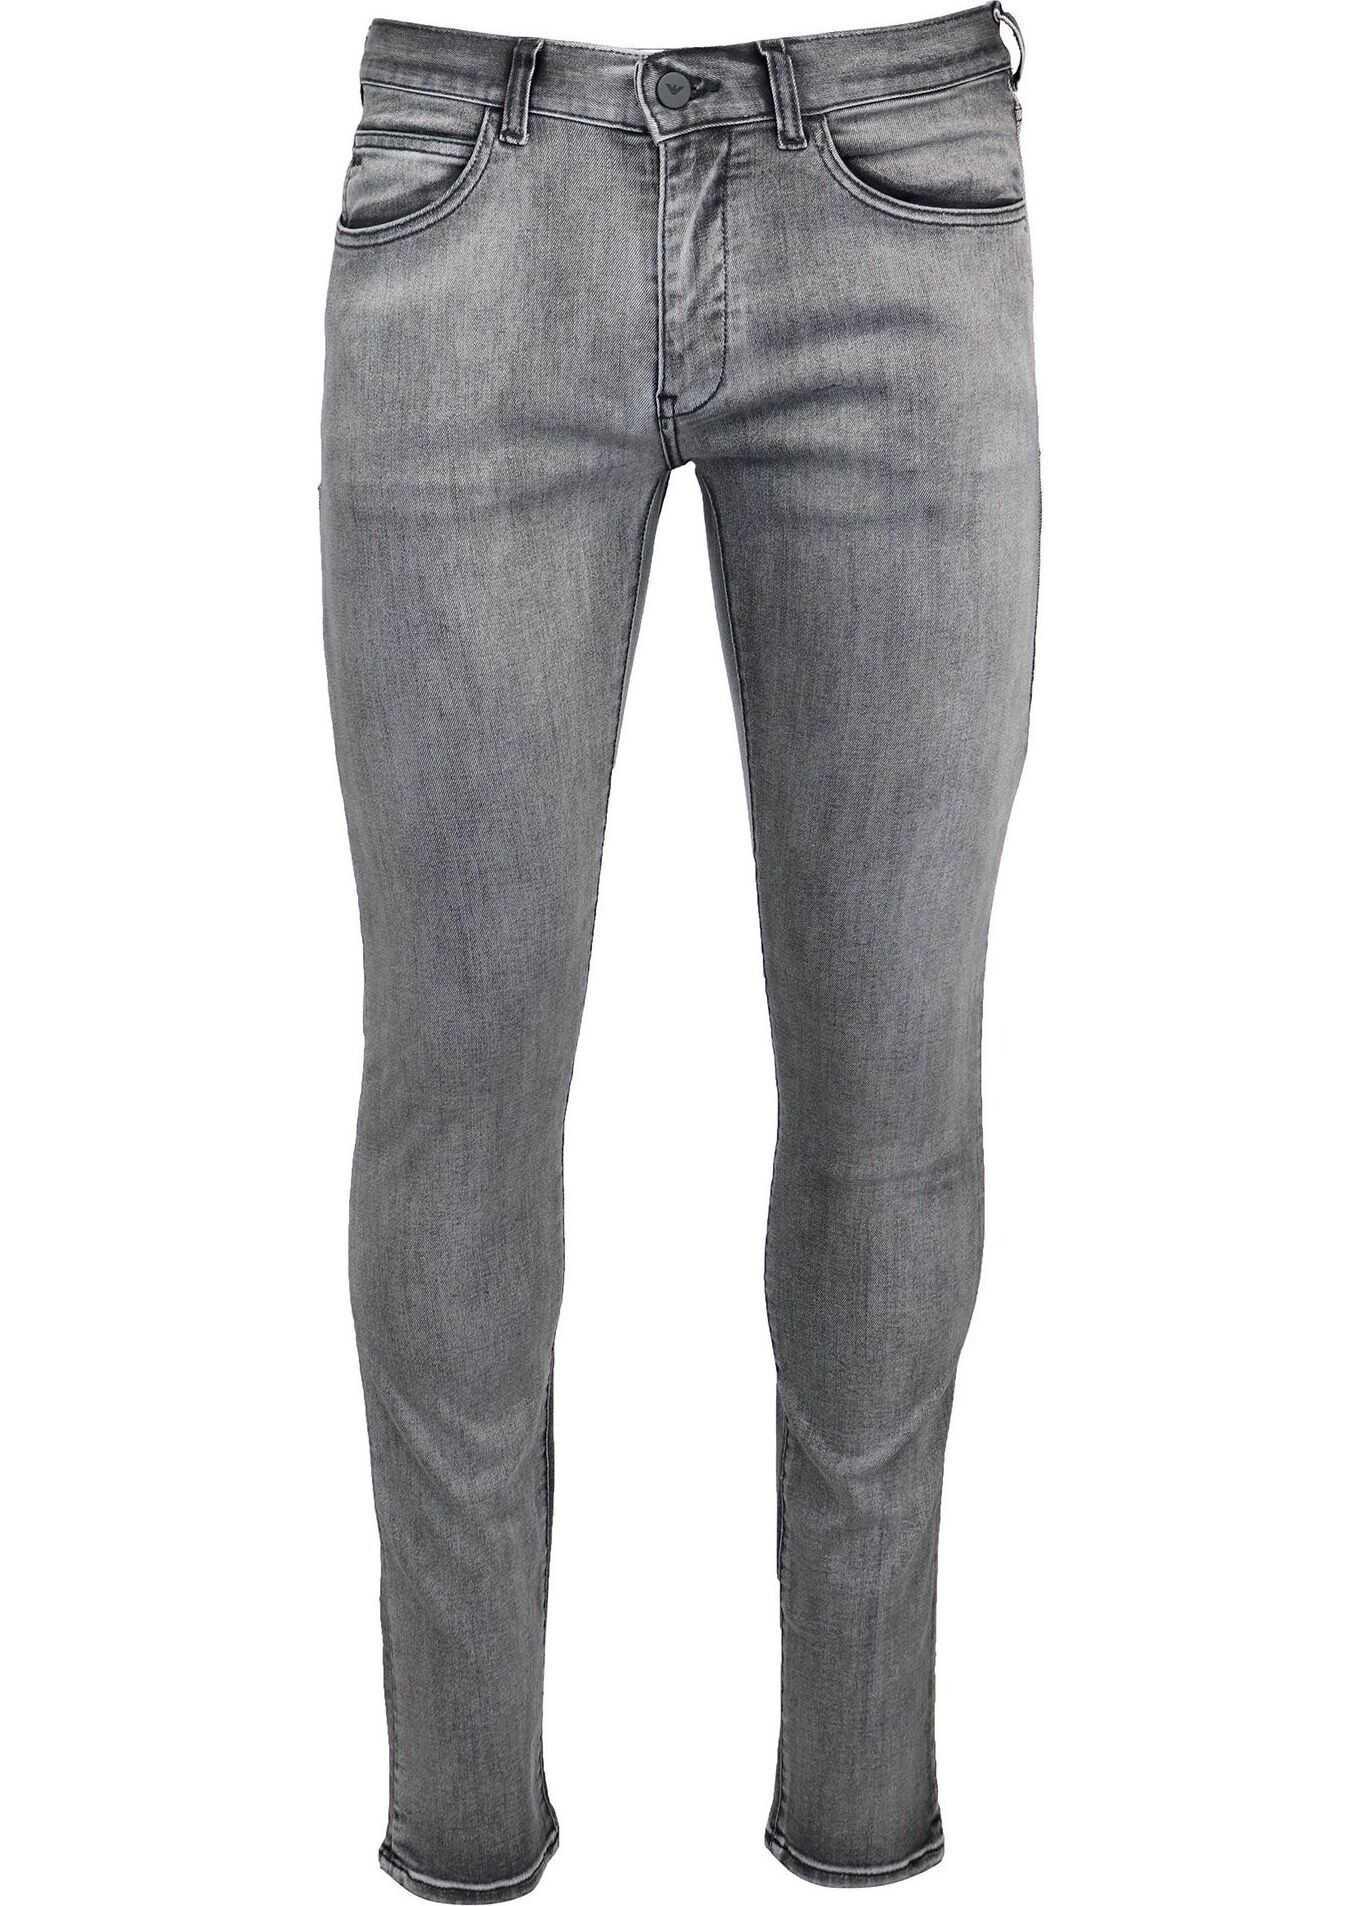 Emporio Armani Cotton Jeans GREY